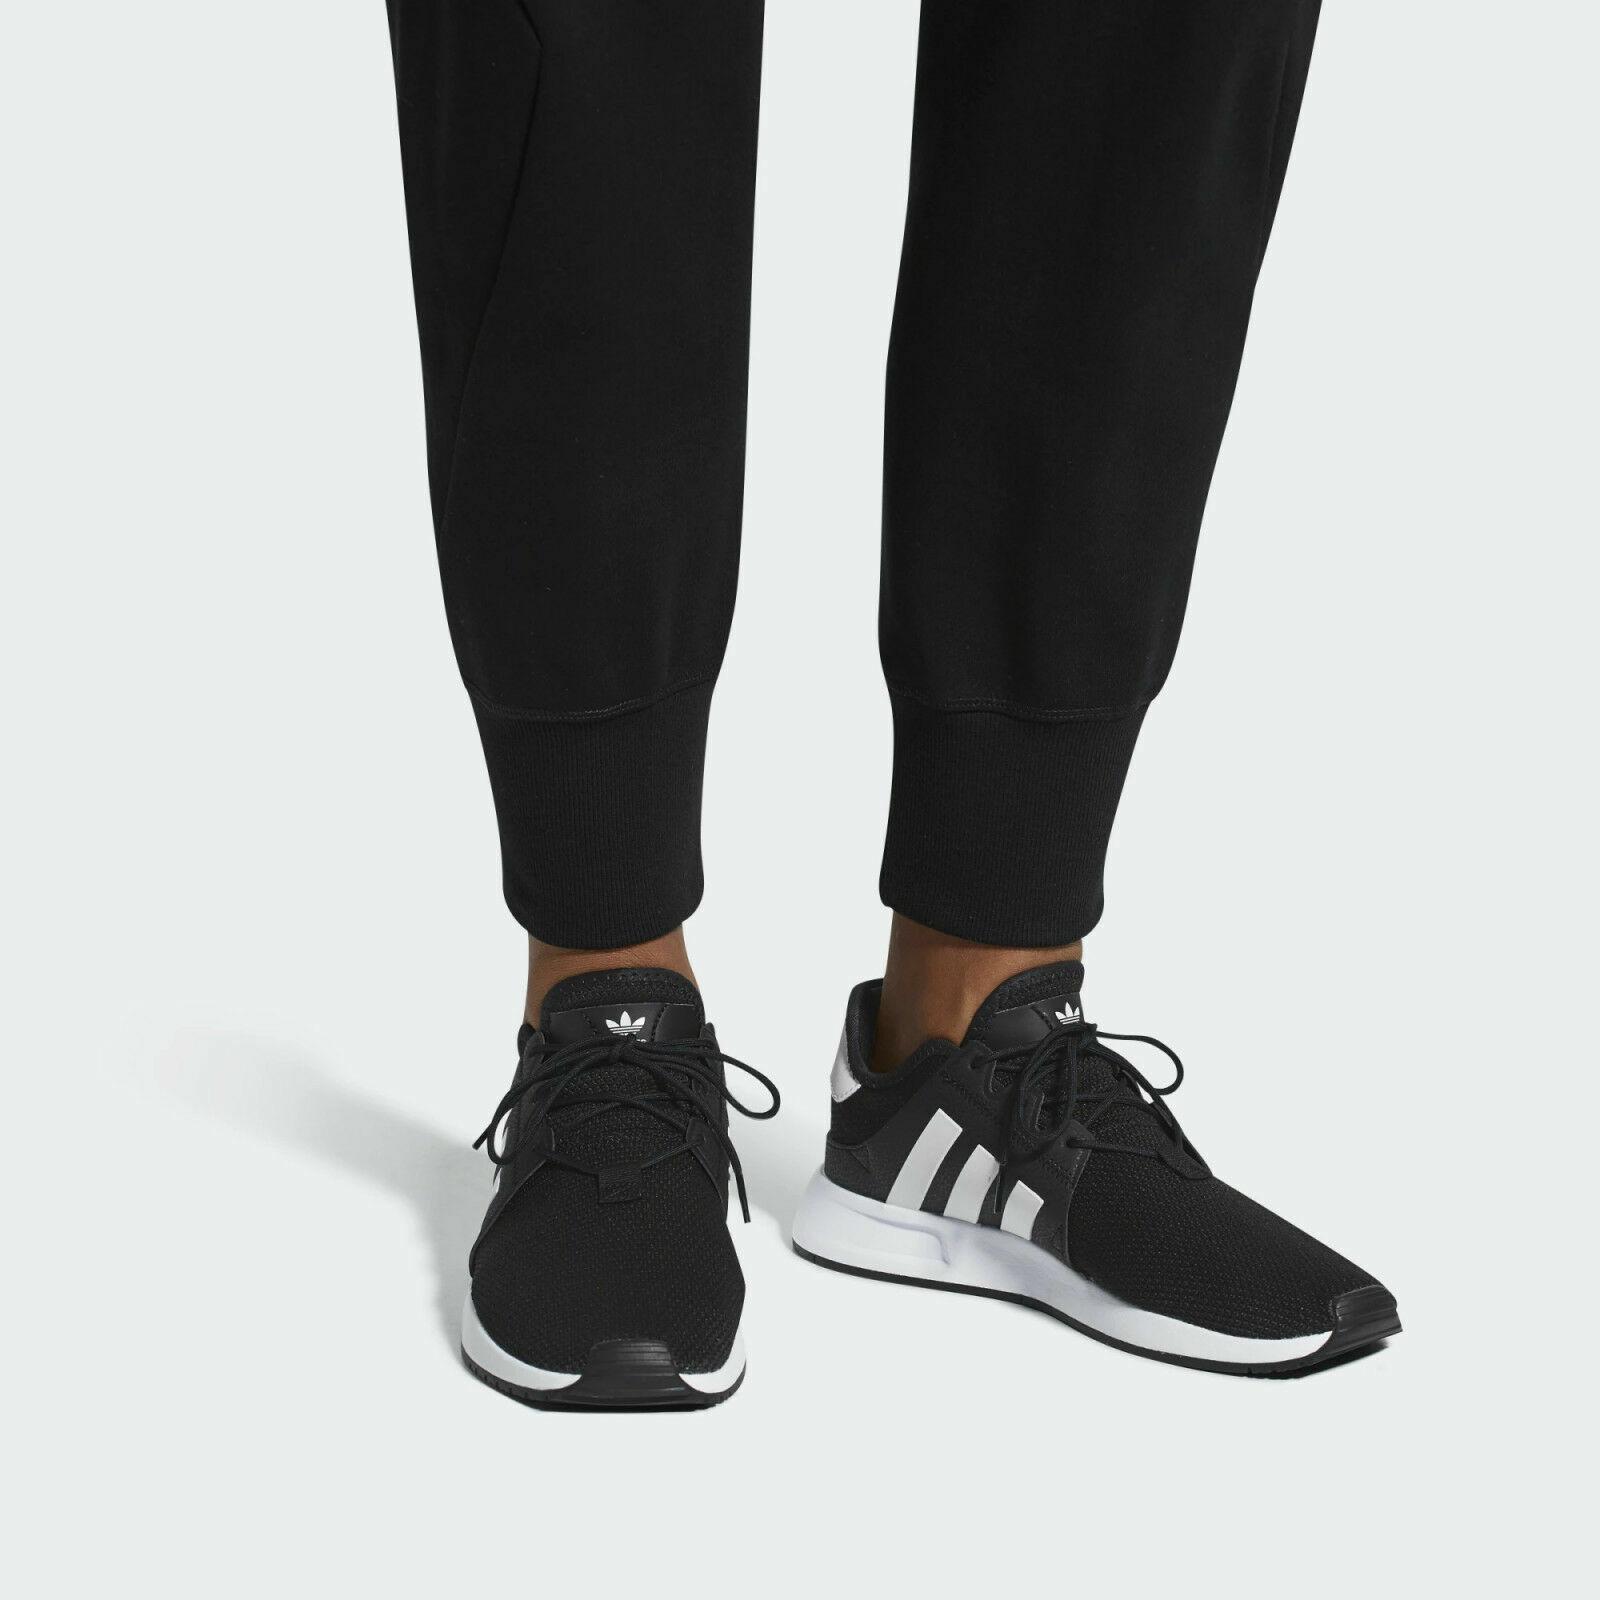 Details zu Adidas X_PLR Men Schuhe Herren Sport Sneaker Laufschuhe black white CQ2405